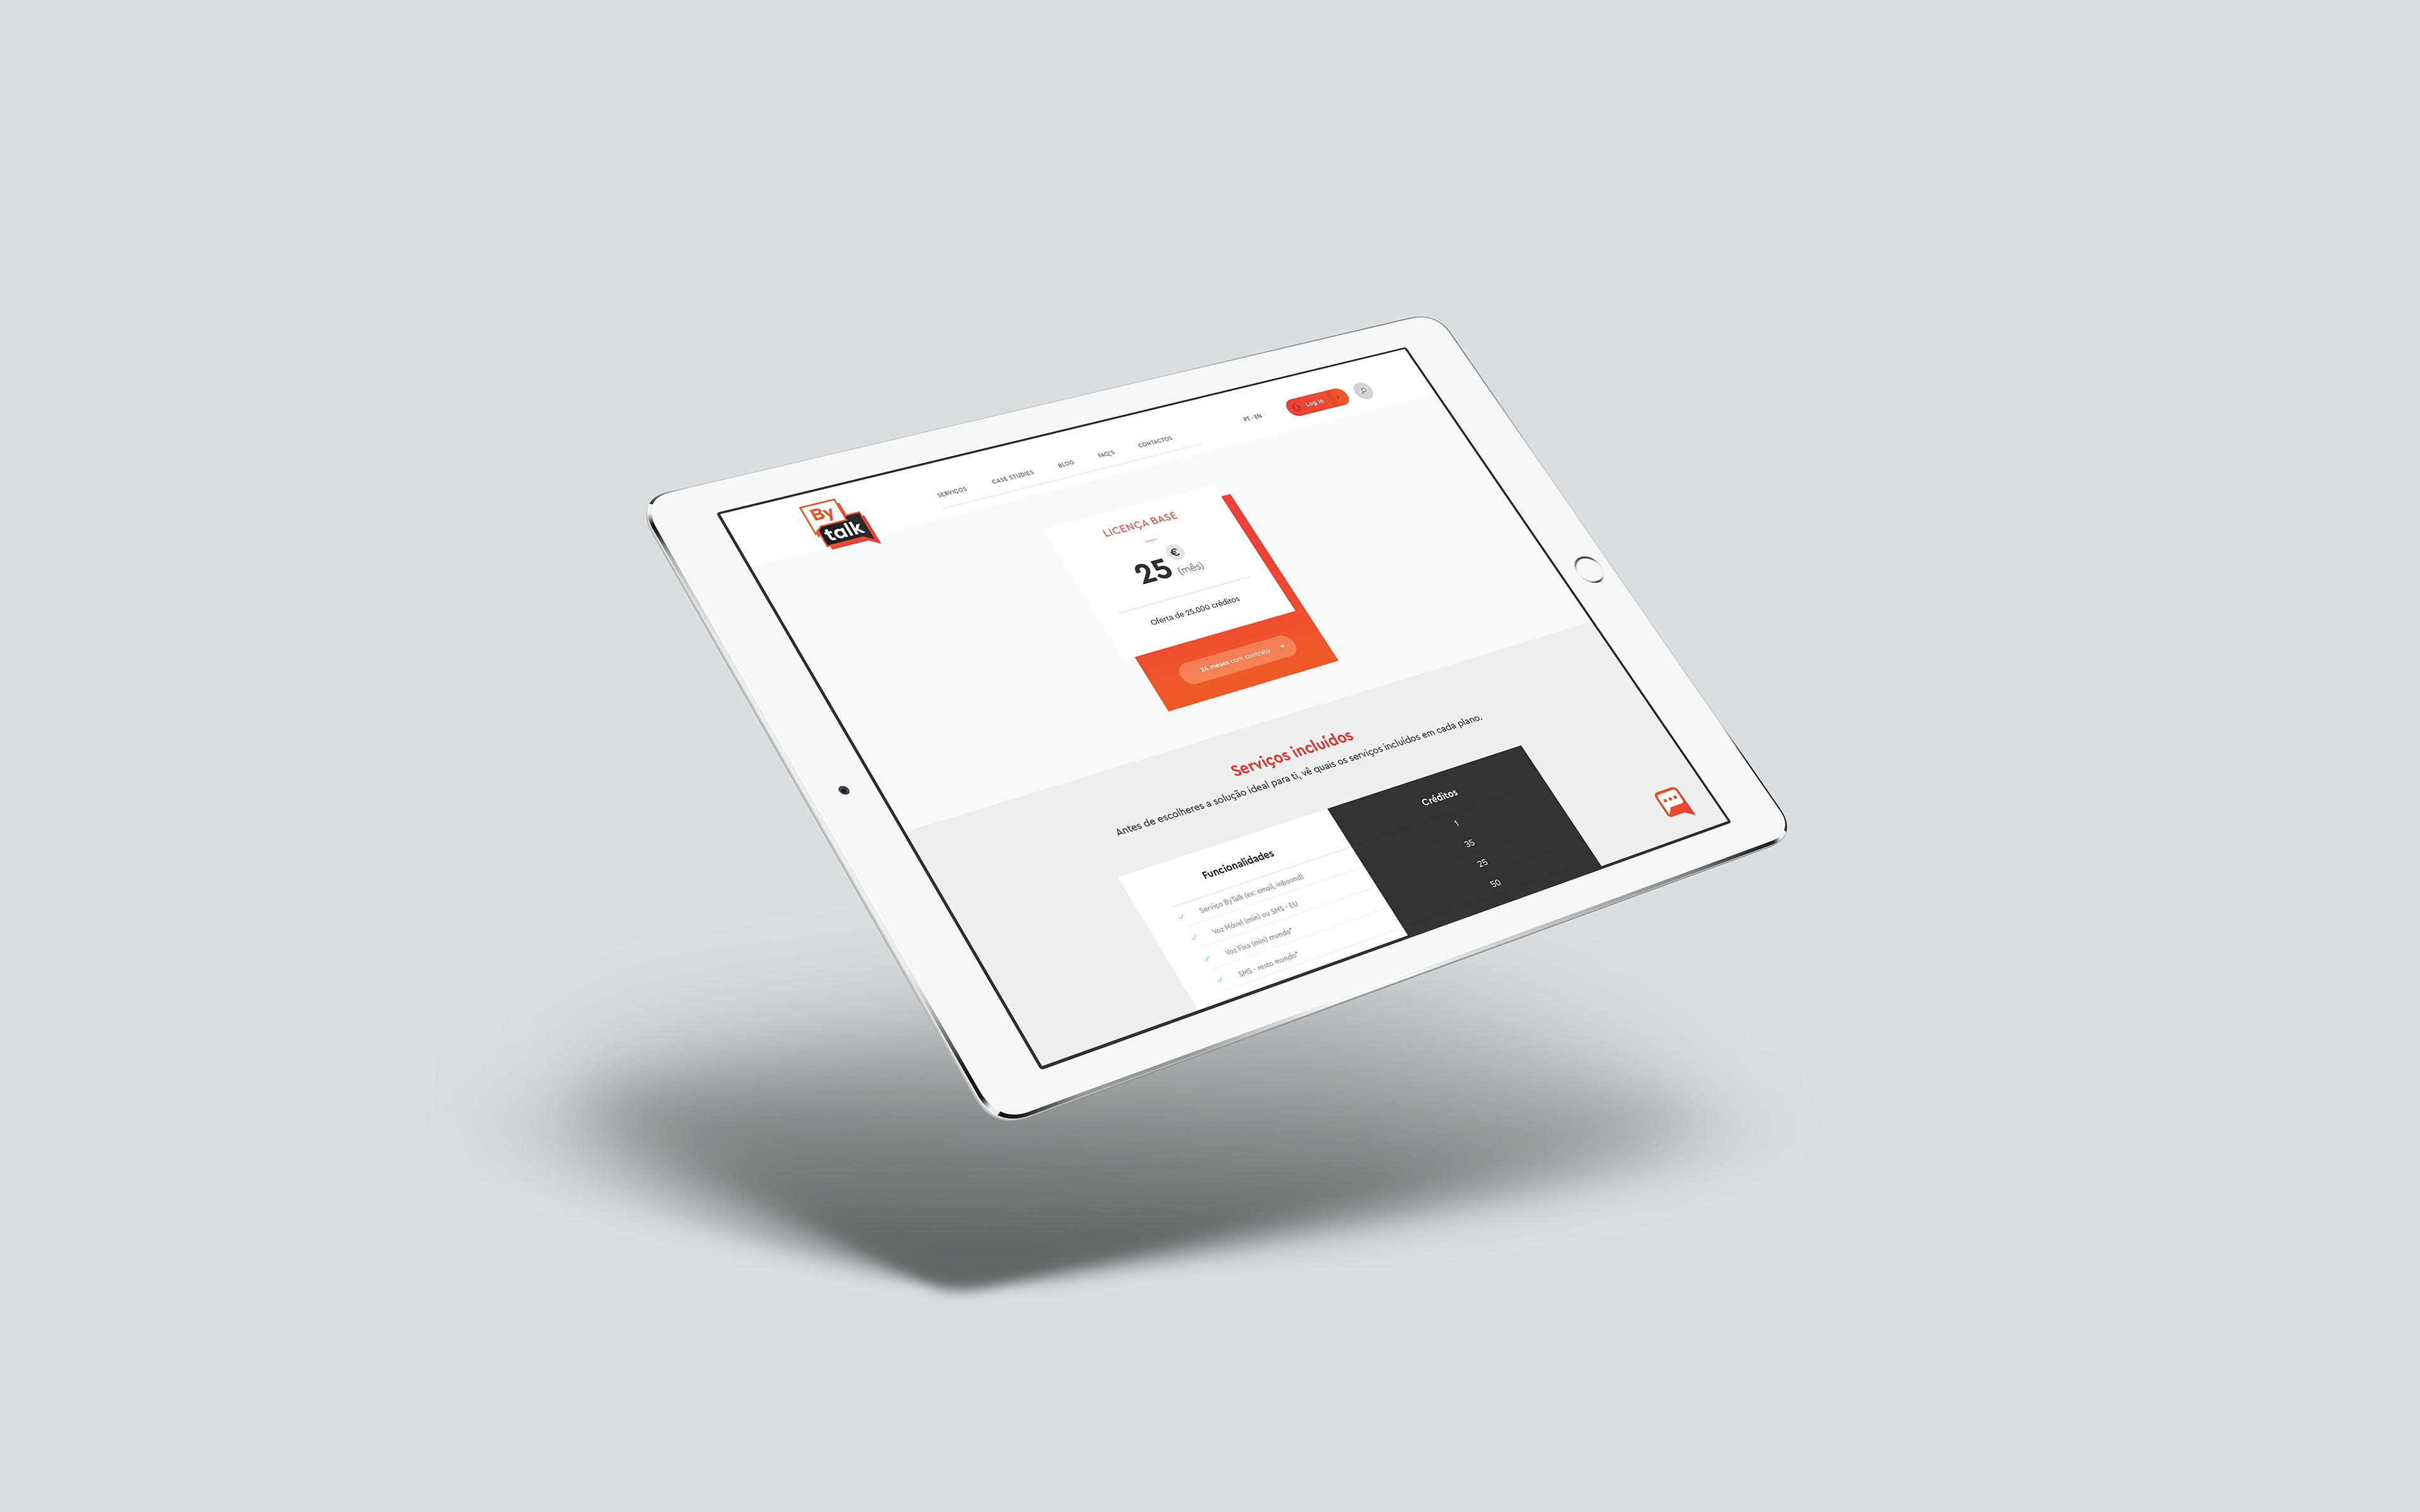 Mockup Web design Bytalk. Imagem representativa do mockup web design da Bytalk.